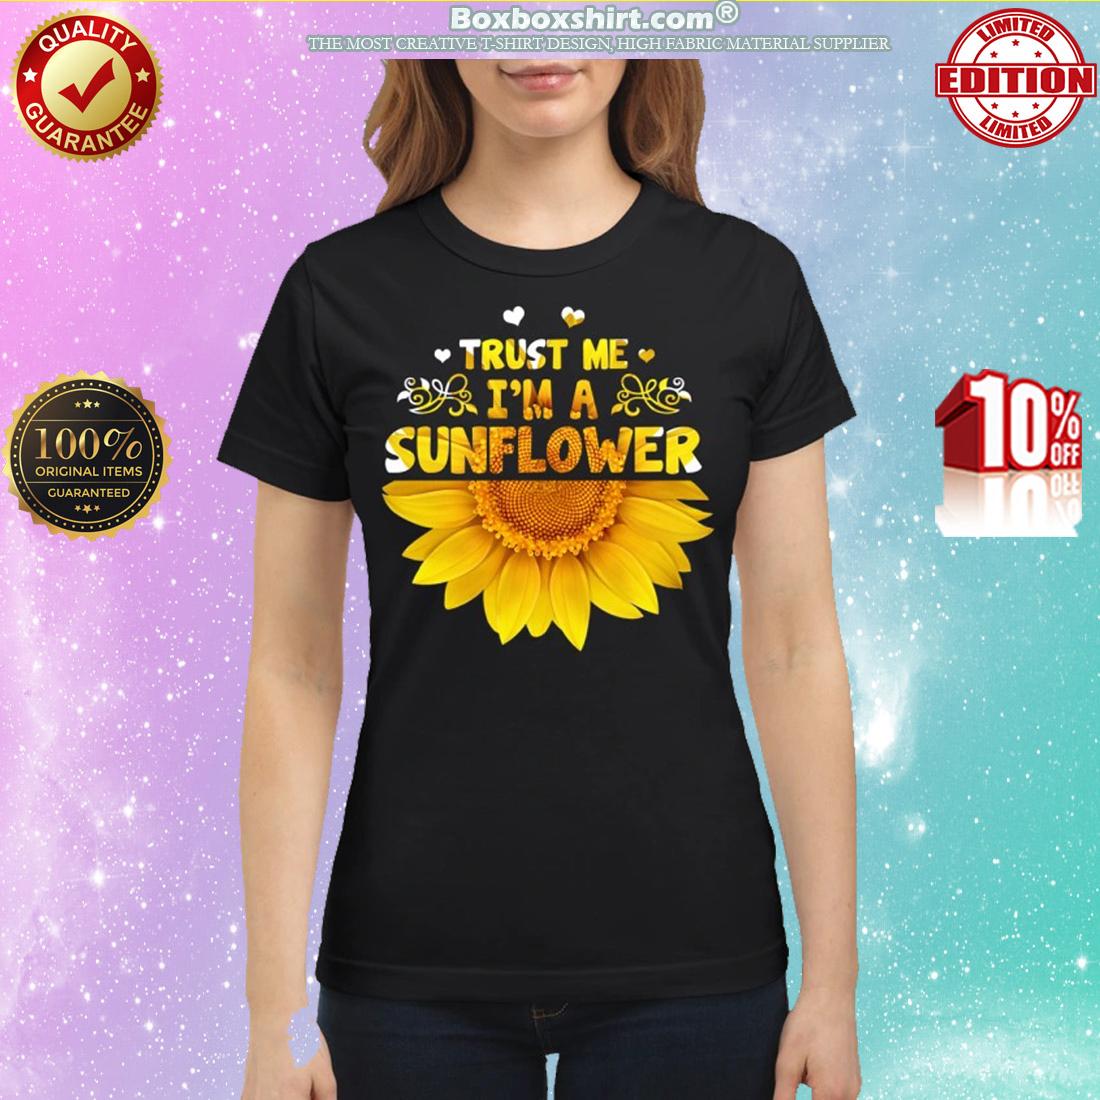 Trust me I'm a sunflower classic shirt